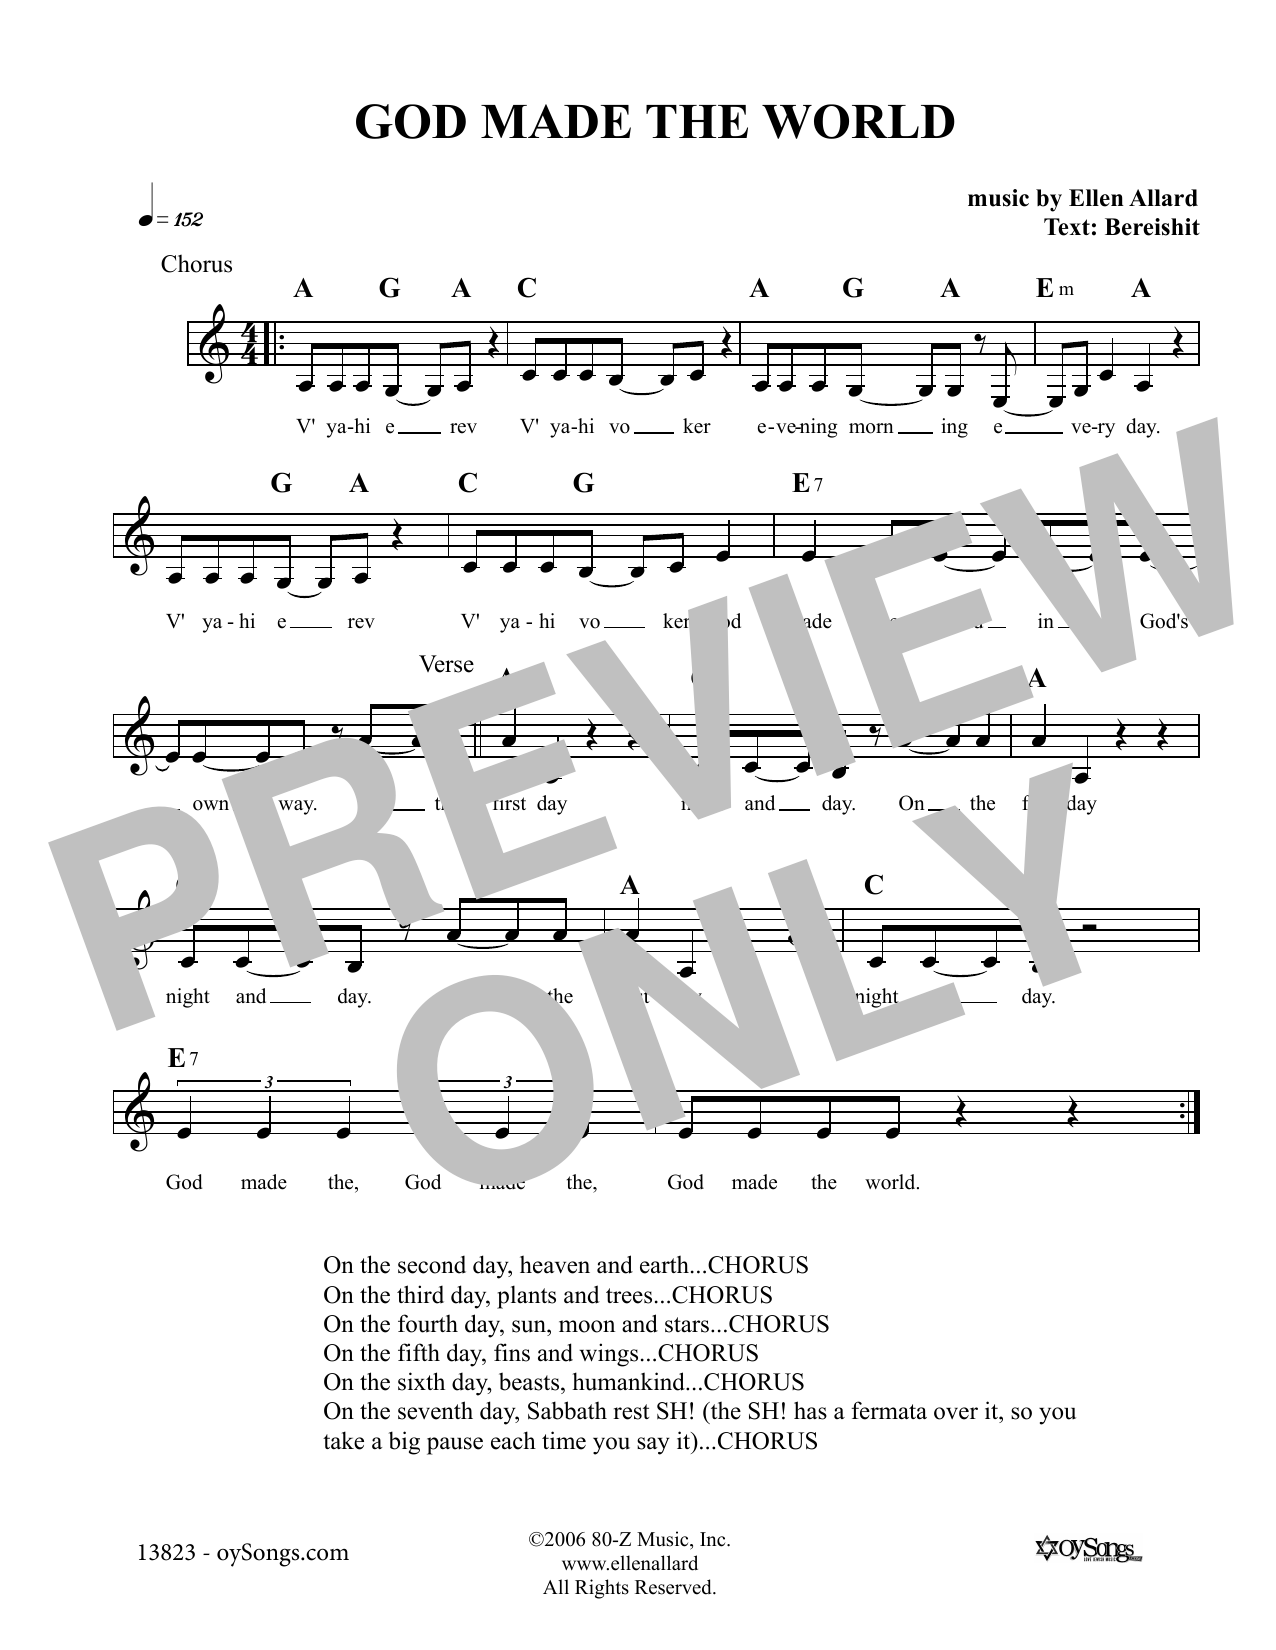 Ellen Allard God Made The World sheet music notes and chords. Download Printable PDF.